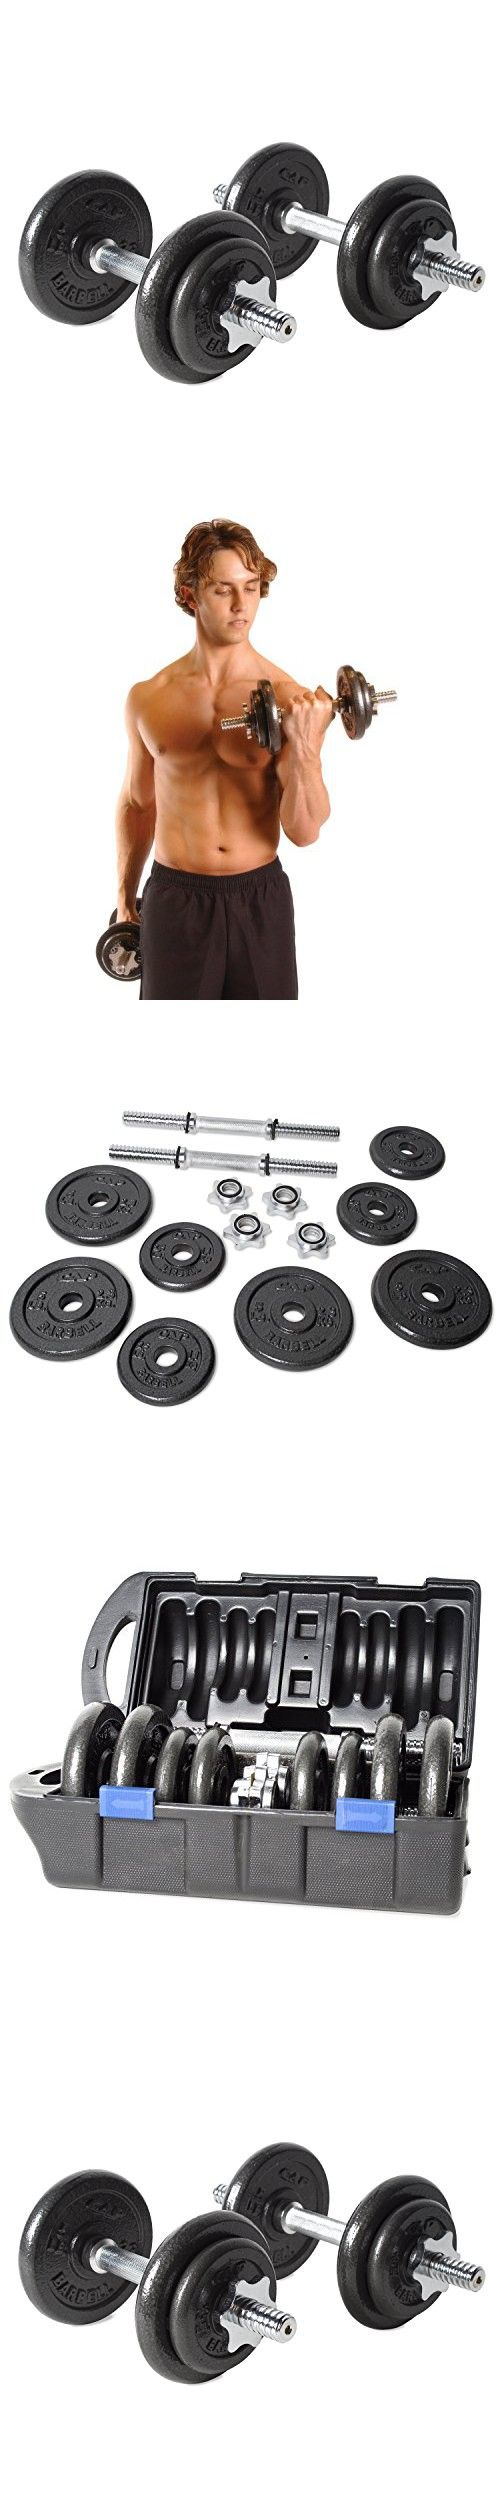 Powerblock classic adjustable dumbbell set reviews - Cap Barbell 40 Pound Adjustable Dumbbell Set With Case